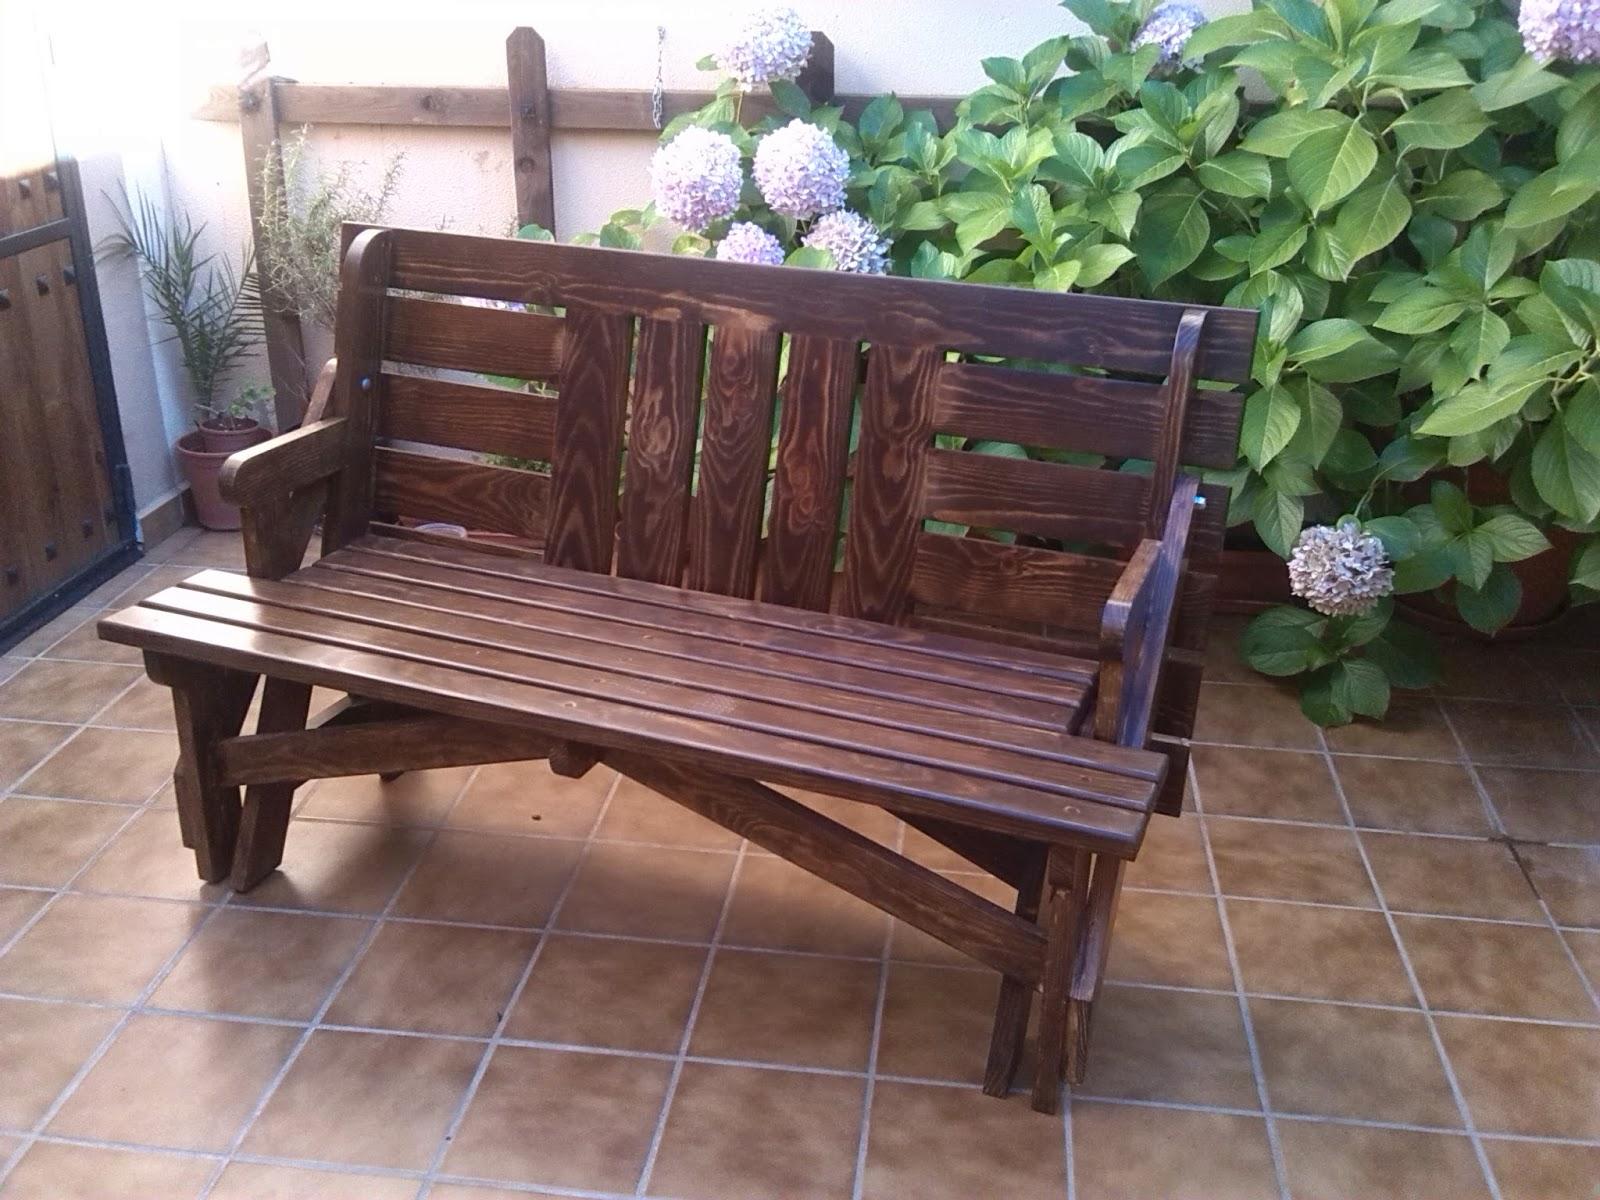 Entre virutas mesa de jardin transformable en banco for Banco madera jardin